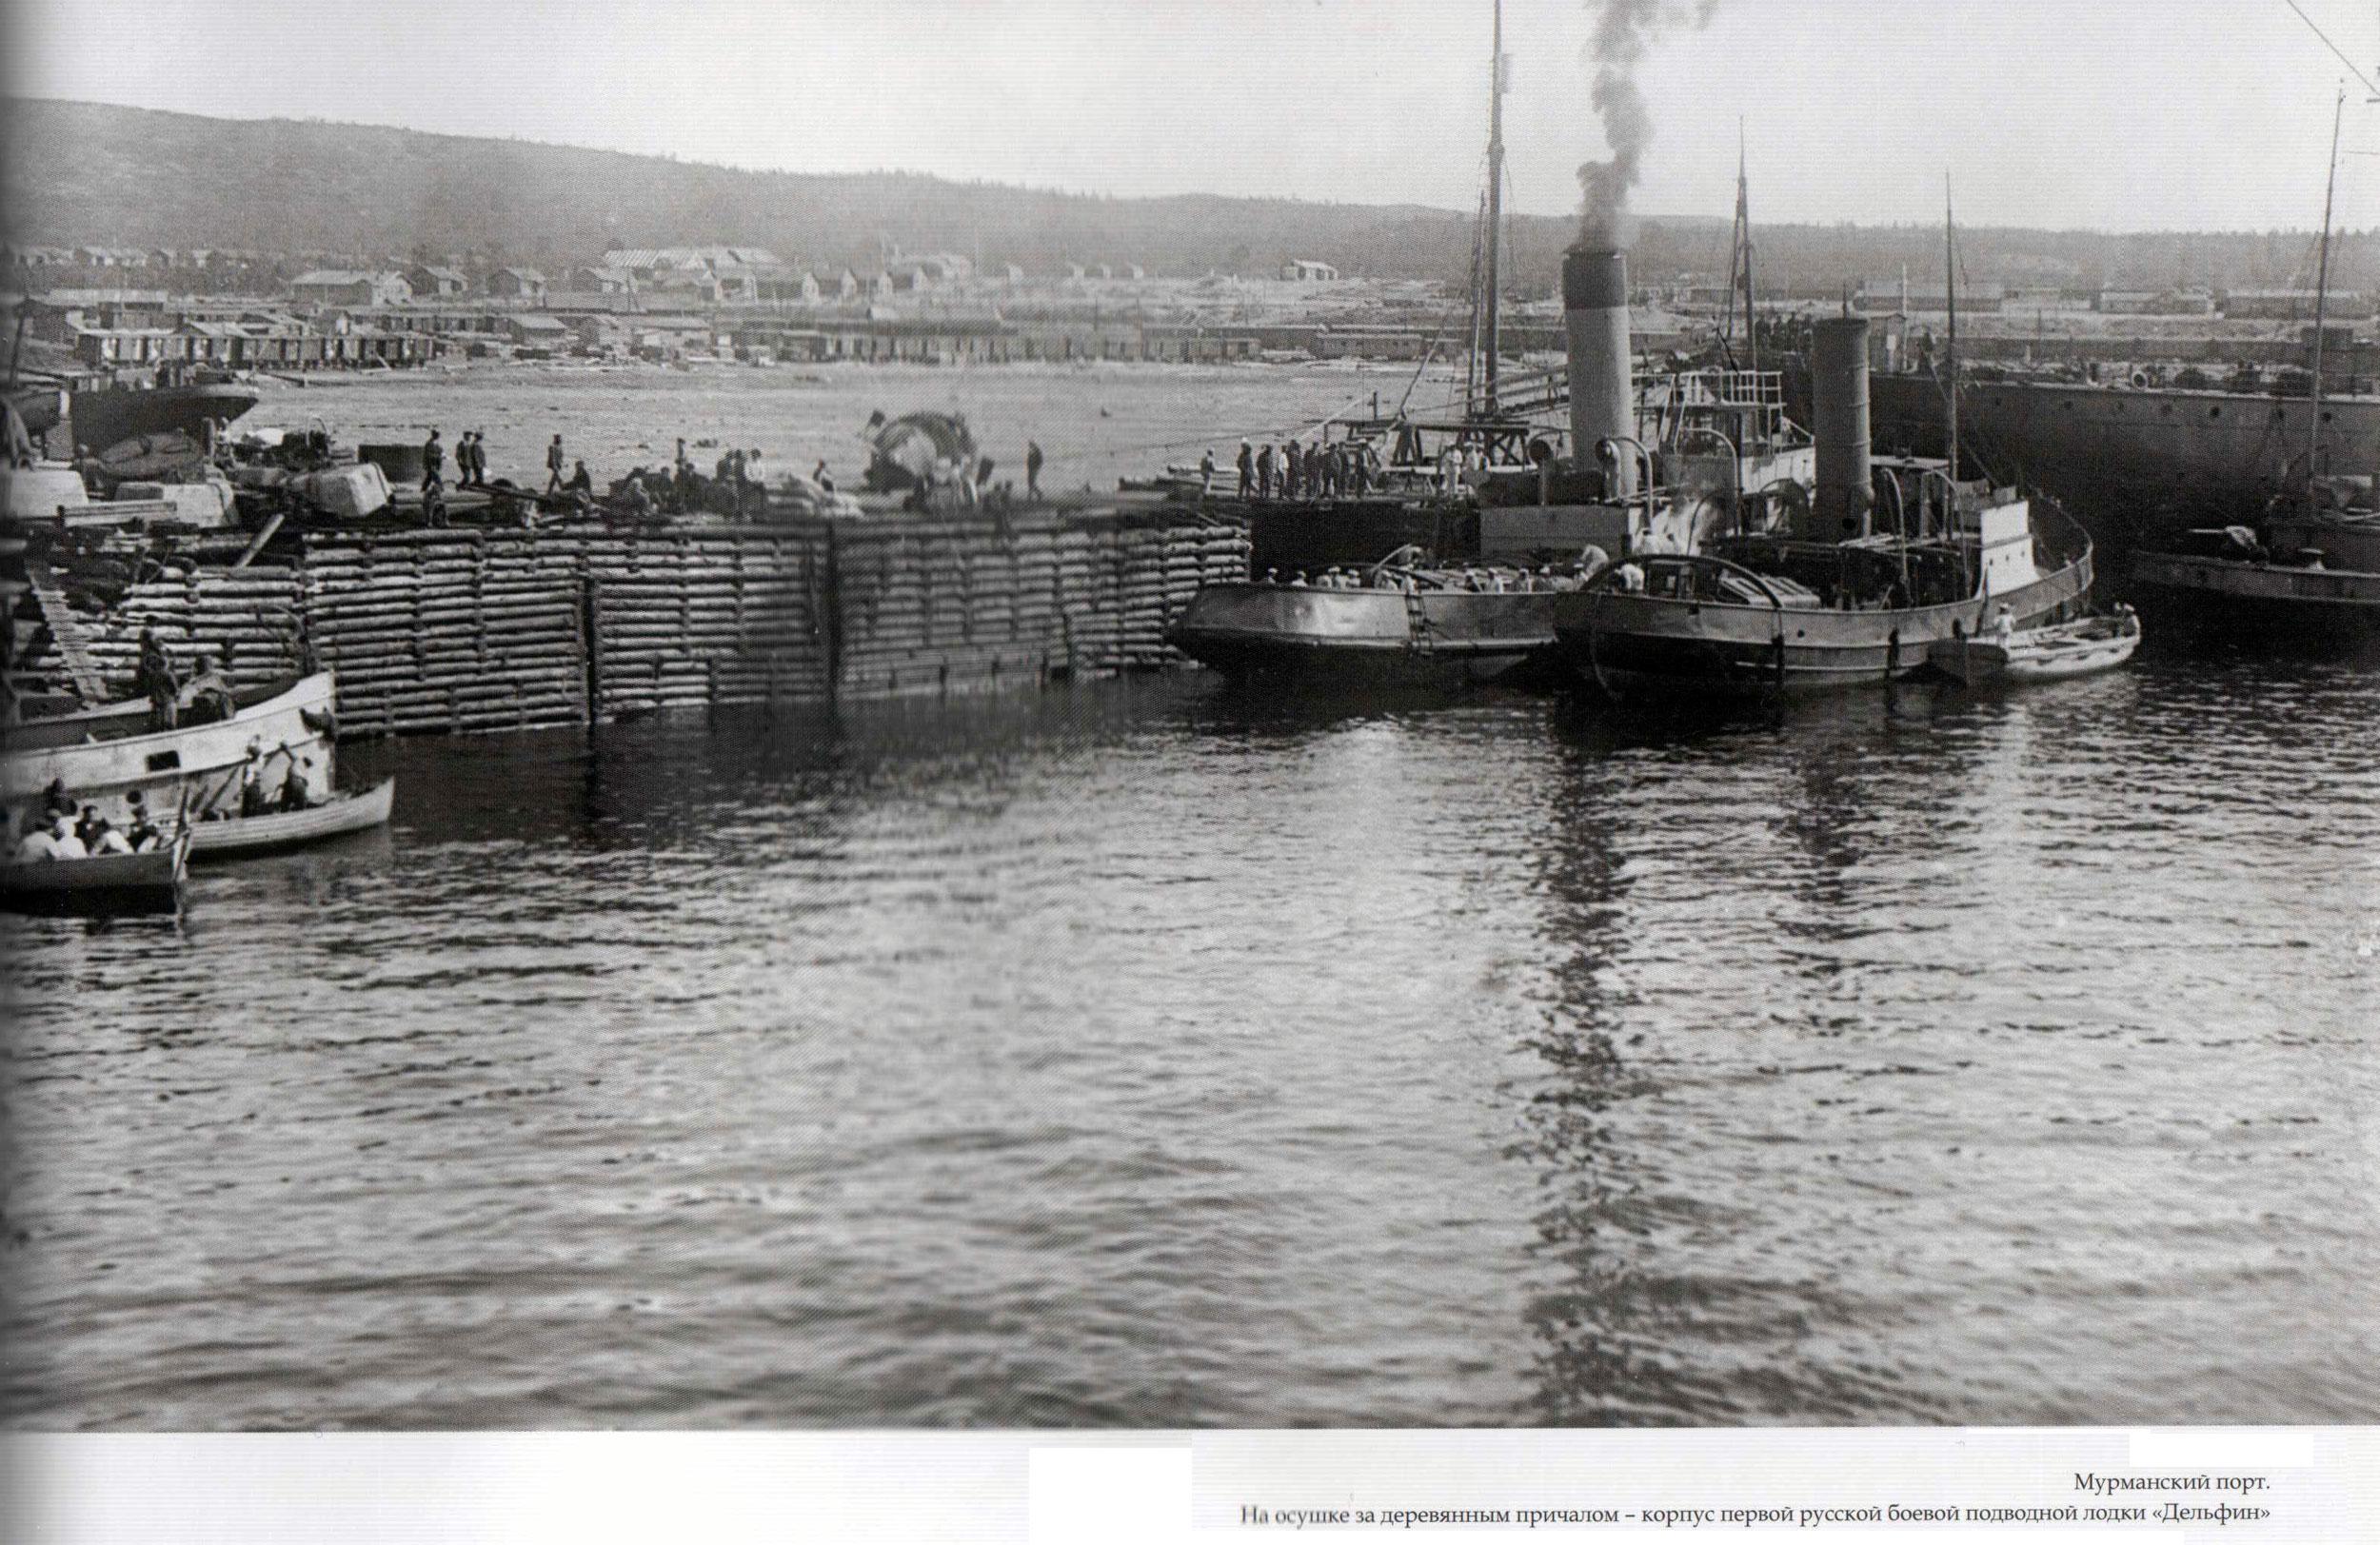 http://www.navy.su/navysub1917/delfin/images/delfin_26.jpg